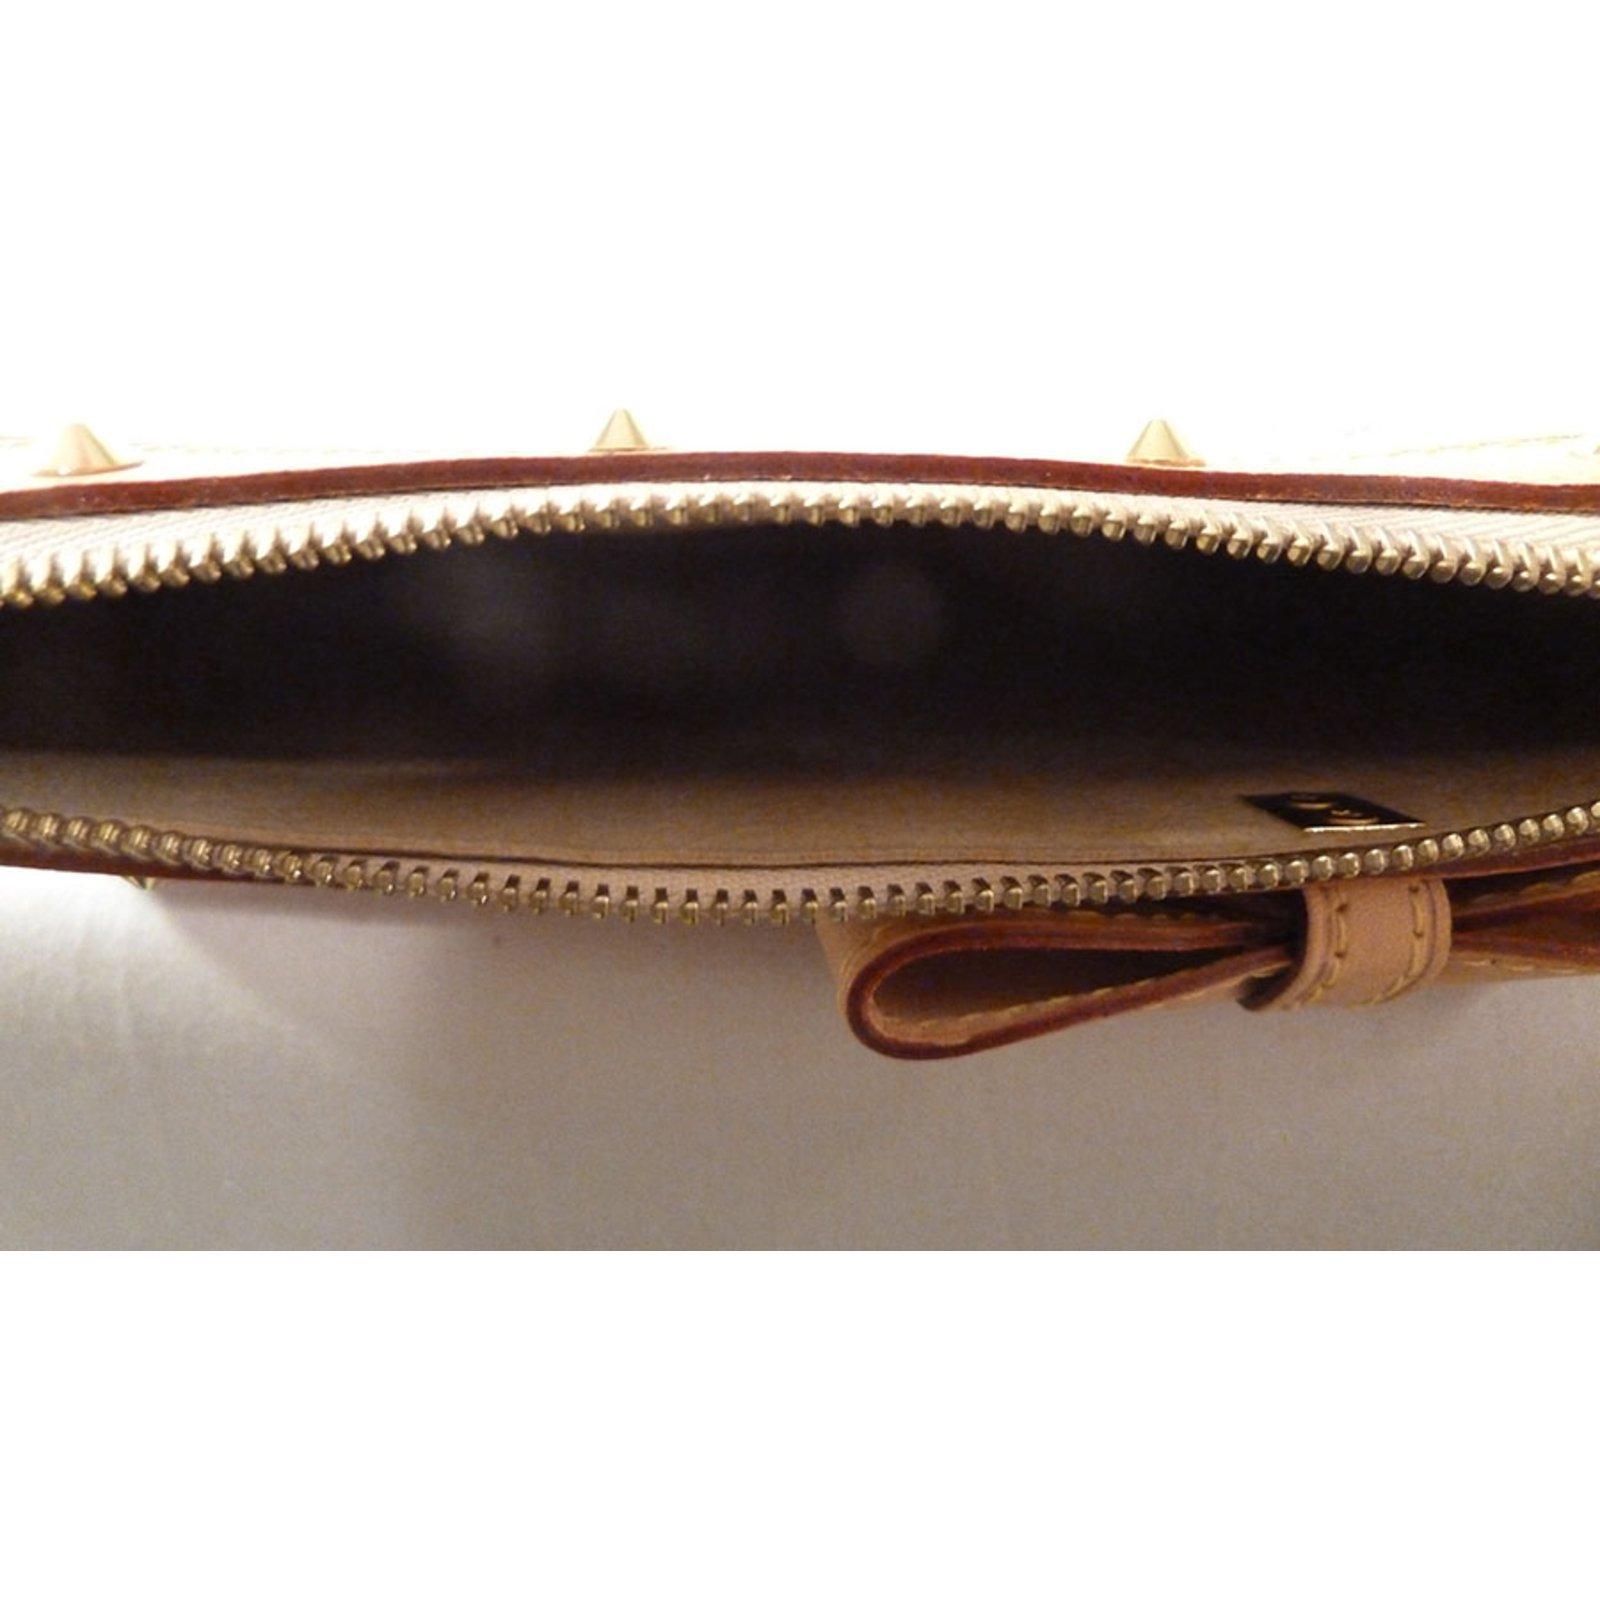 Louis Vuitton Takashi Murakami Cherry Blossom Monogram Stud Shoulder Bag  Handbags Other Pink ref.37553 - Joli Closet f4b864935dcab